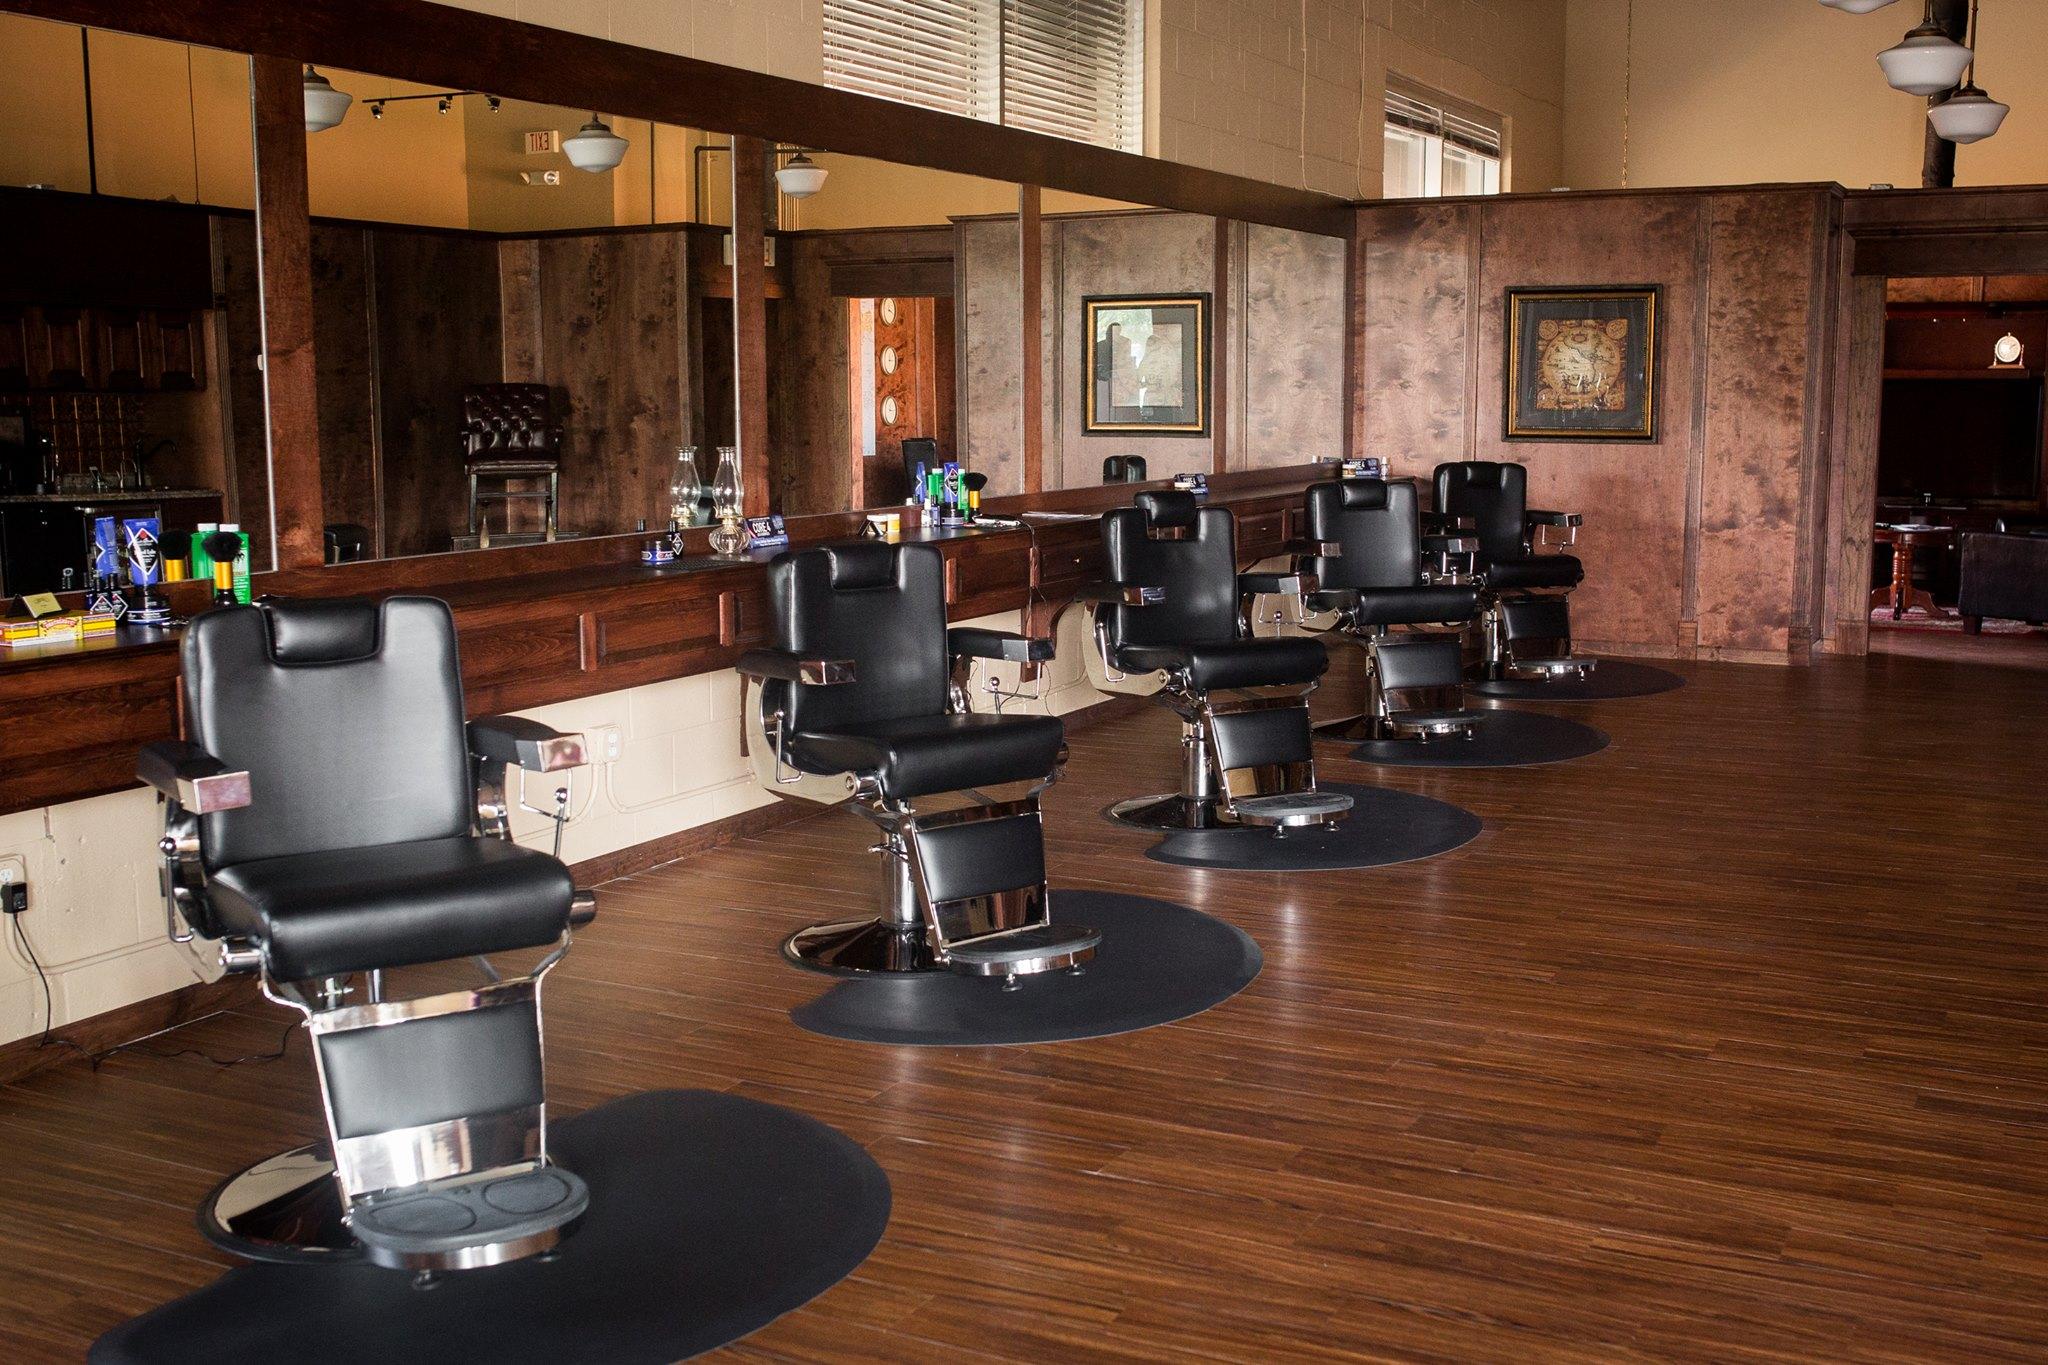 South Carolina's Top Rated Local® Barber Shop Award Winner: Frank's Gentleman's Salon